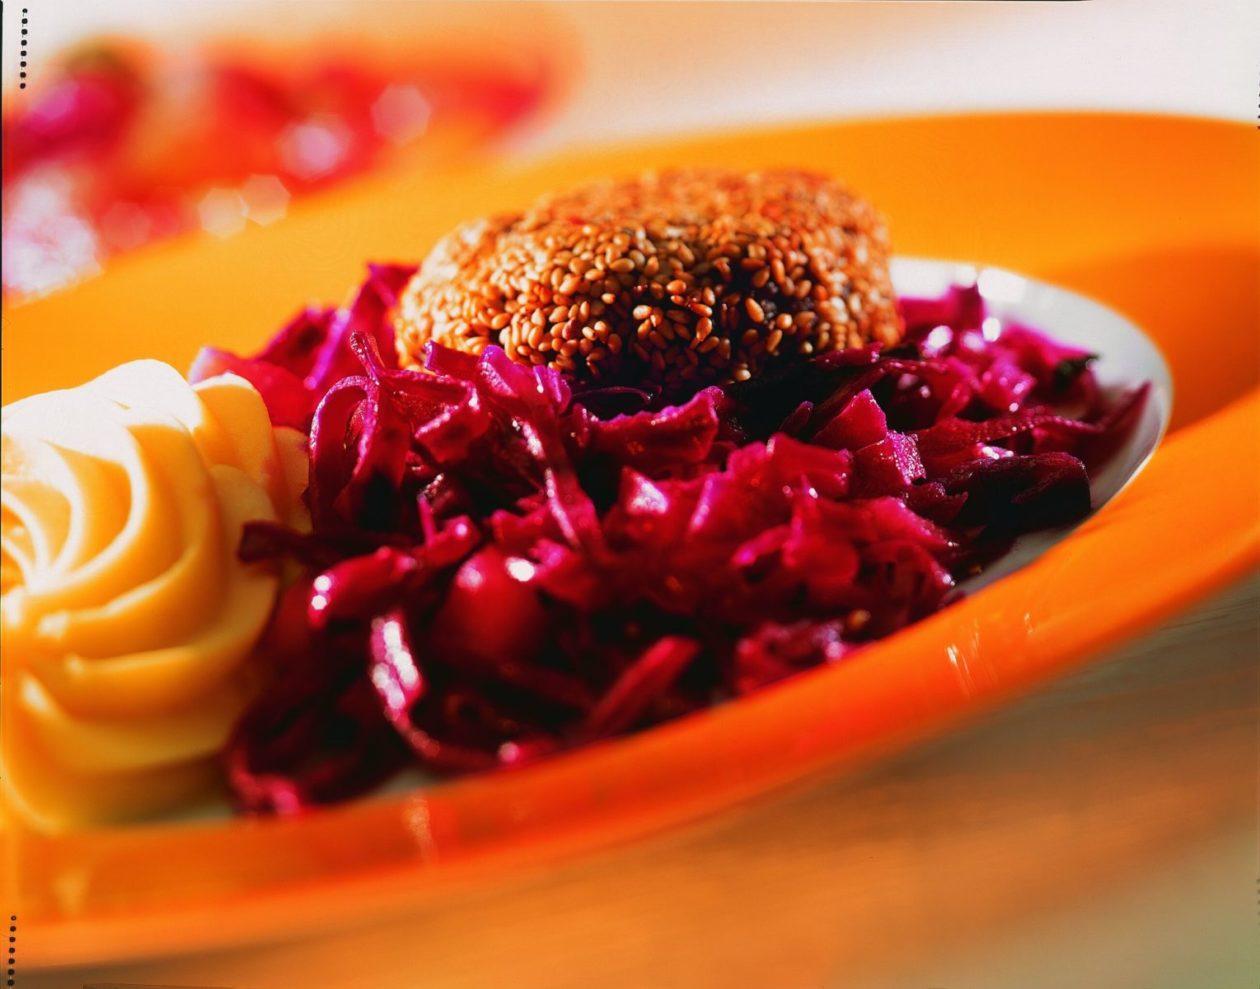 Sesam-Hacksteak mit Rotkohl - BCM Diät Rezepte.at